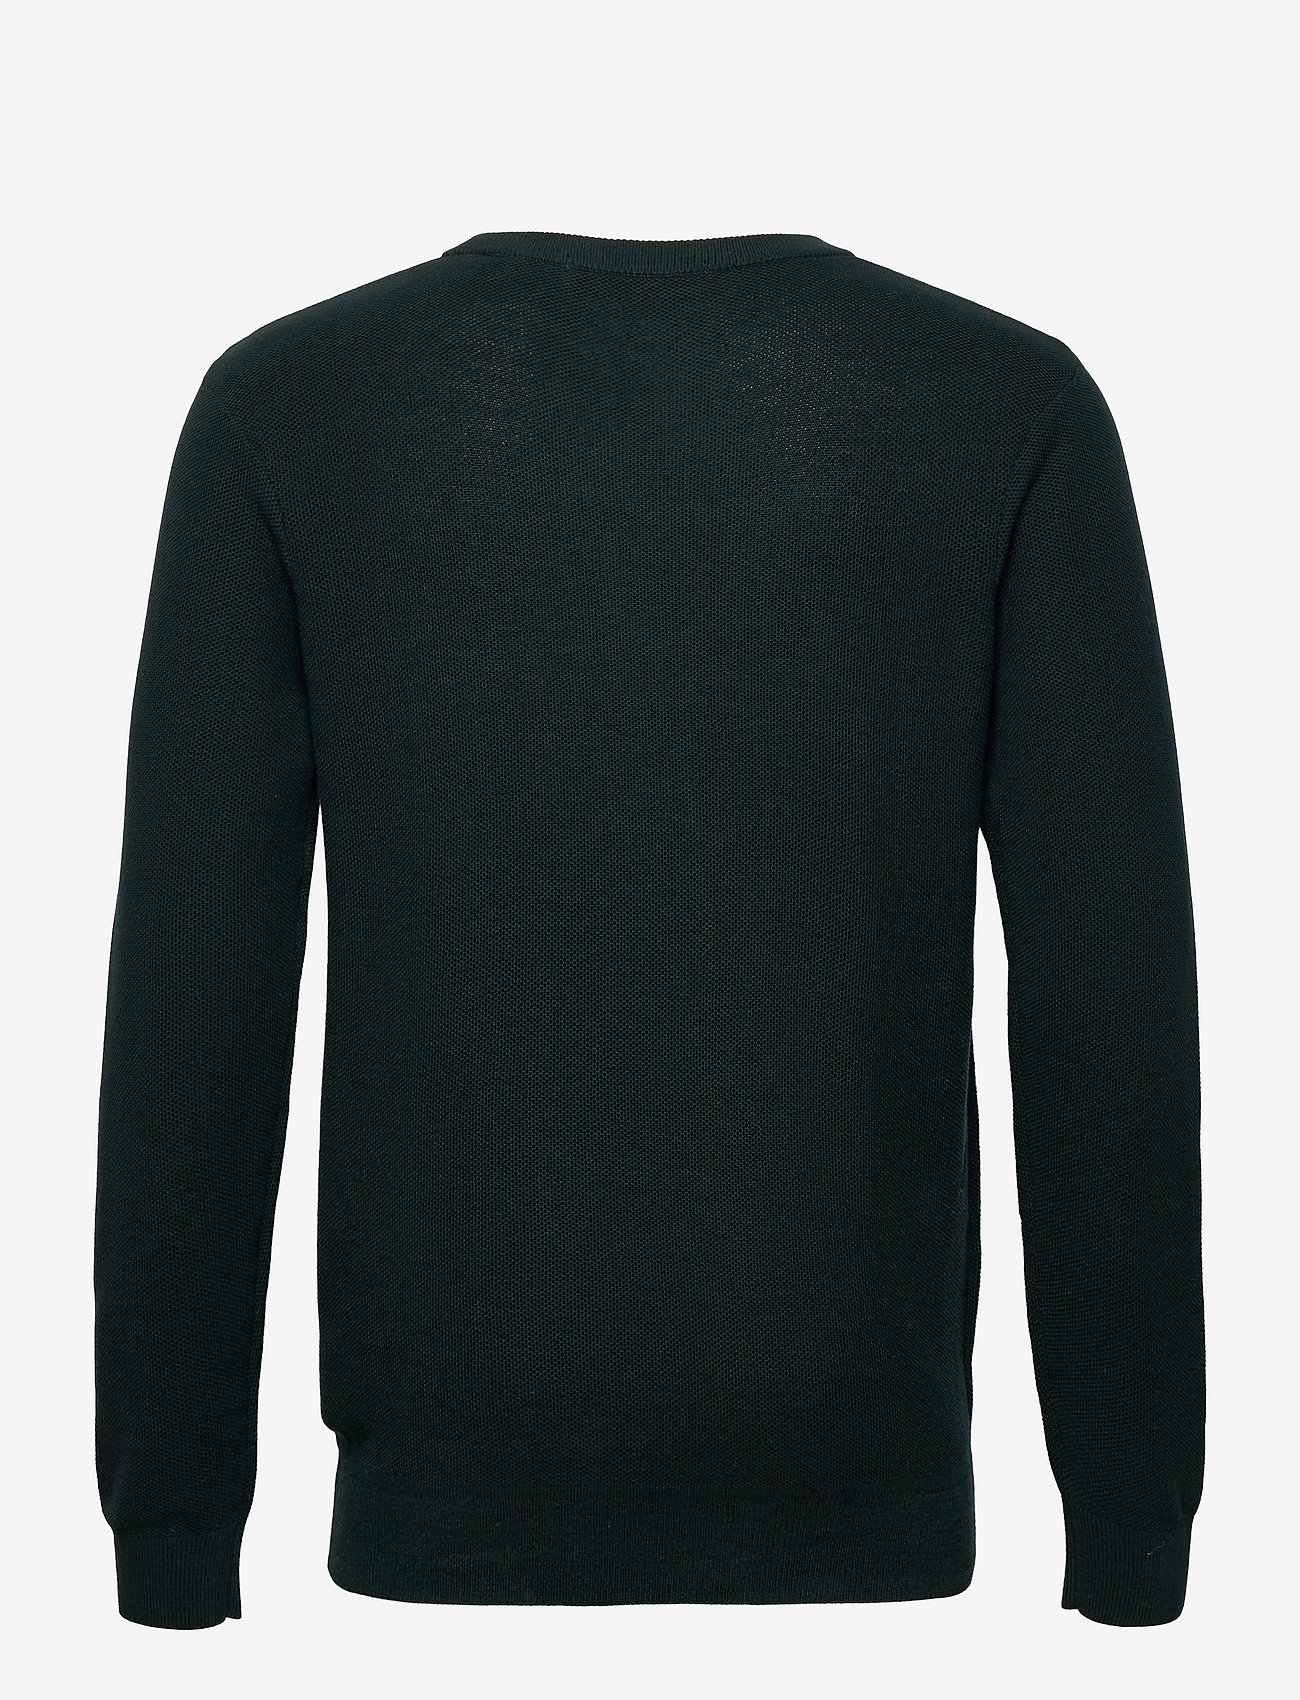 Scotch & Soda - Organic cotton crewneck pull in structured knit - basic gebreide truien - sea green - 1